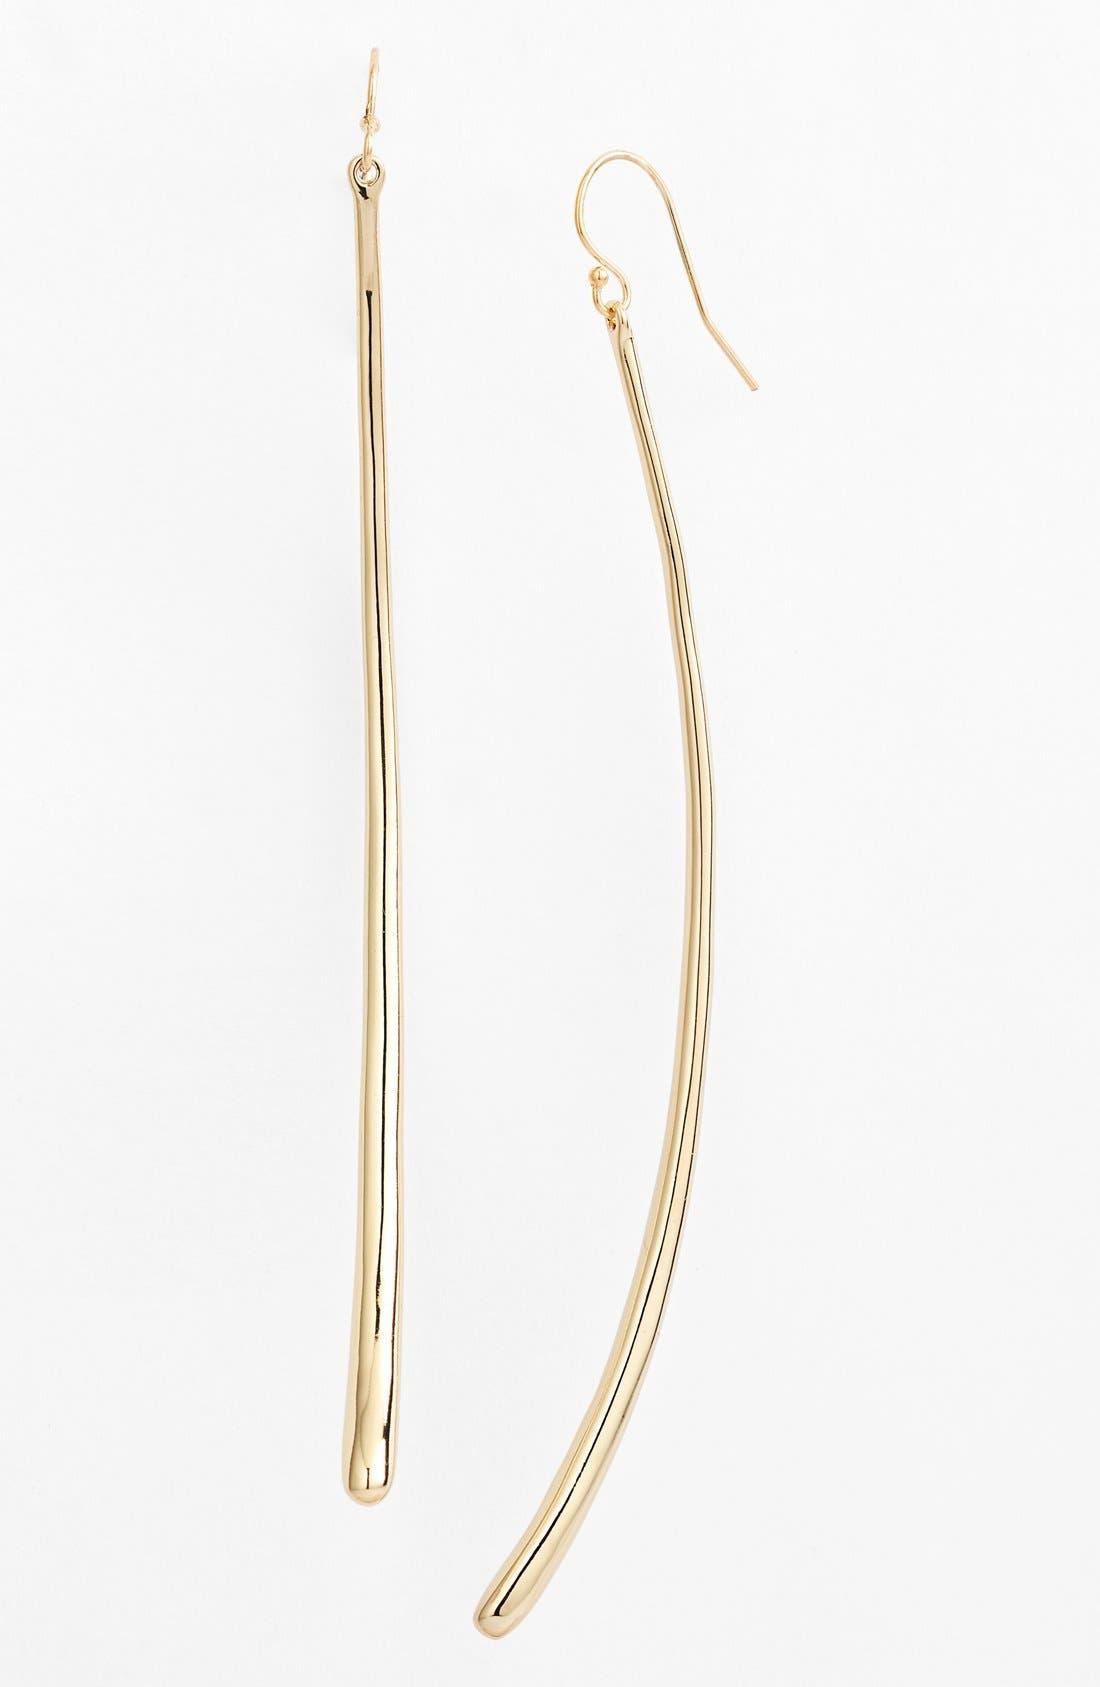 Alternate Image 1 Selected - Alexis Bittar 'Miss Havisham' Linear Earrings